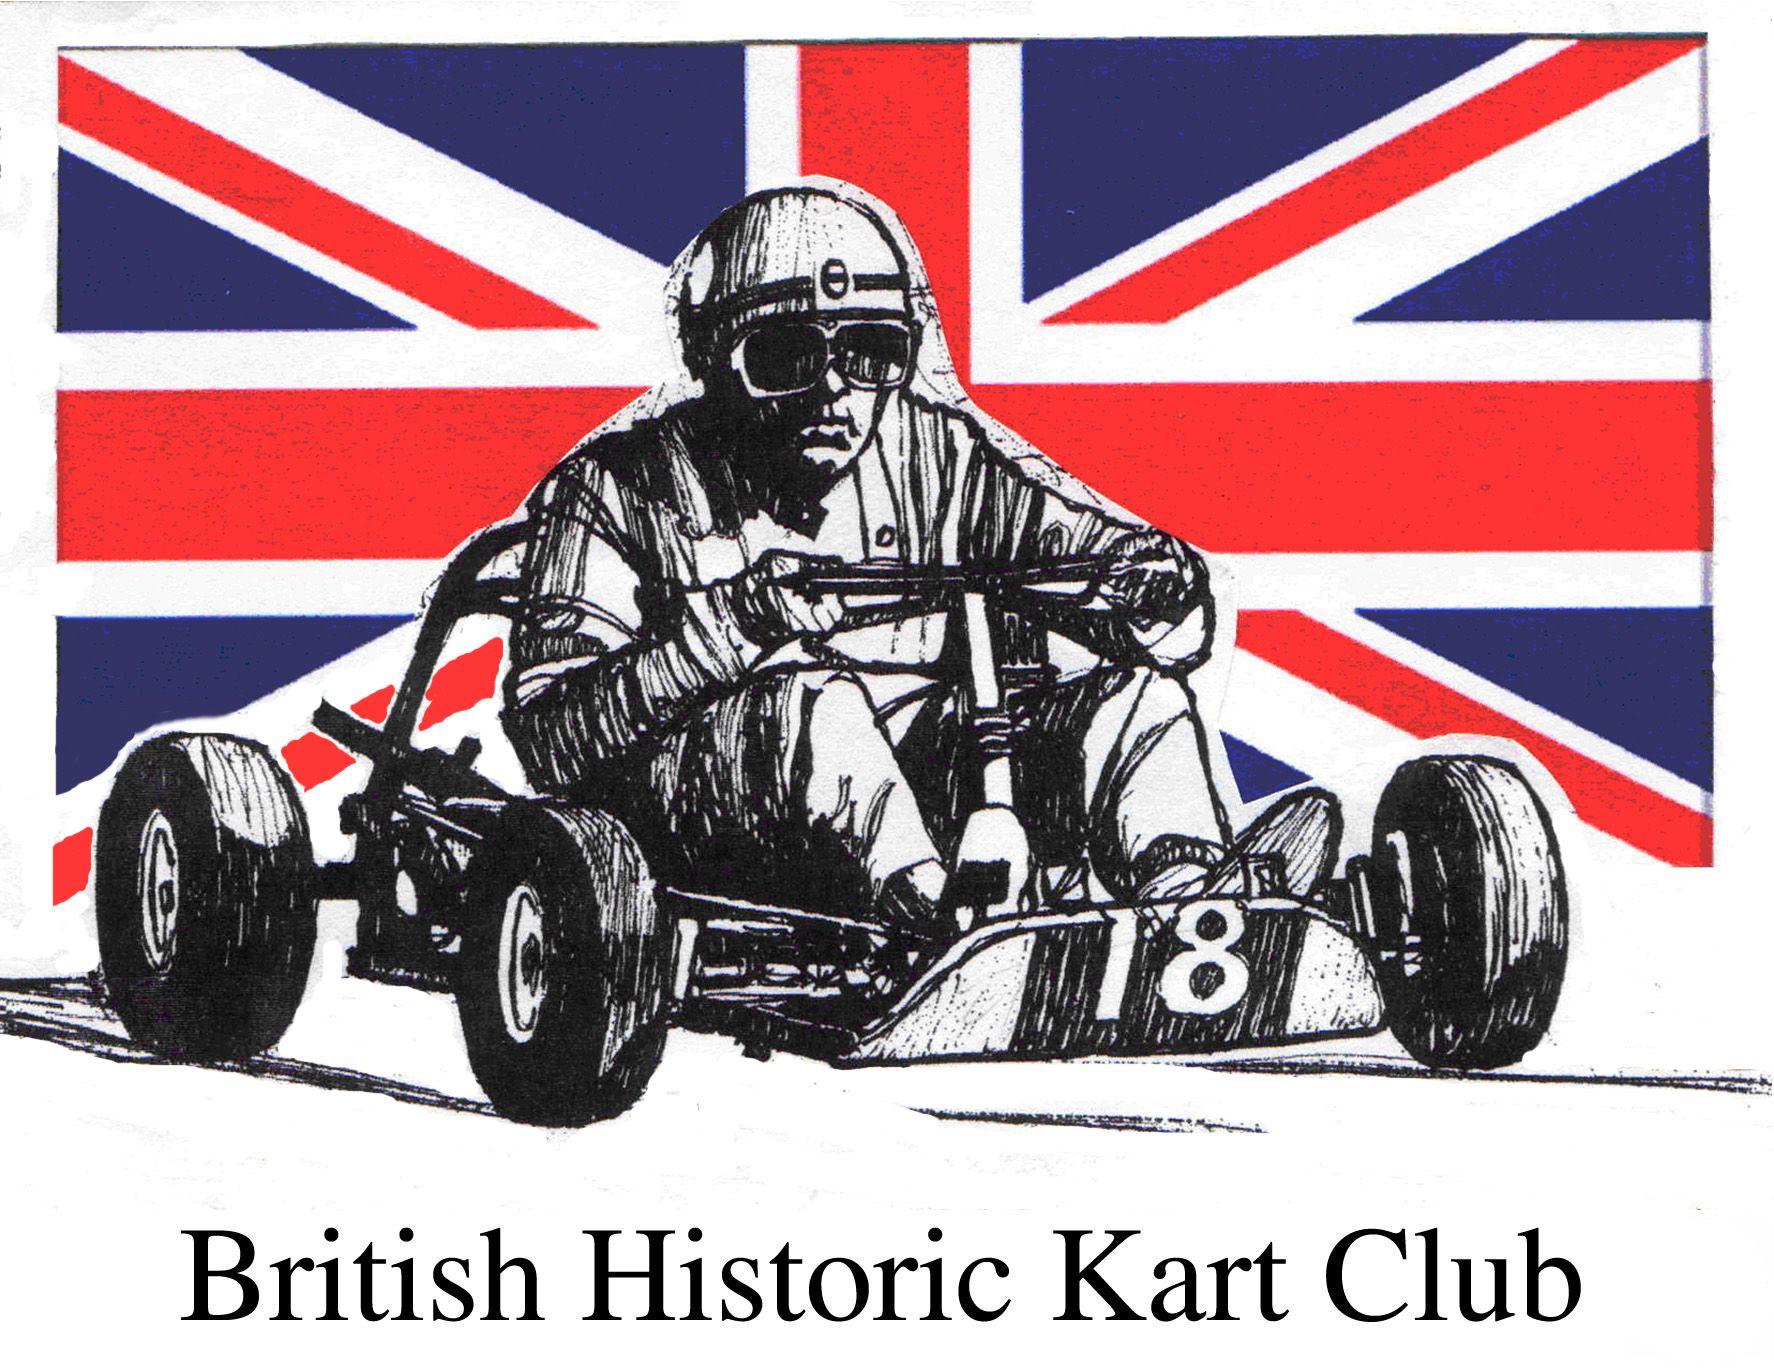 British Historic Kart Club